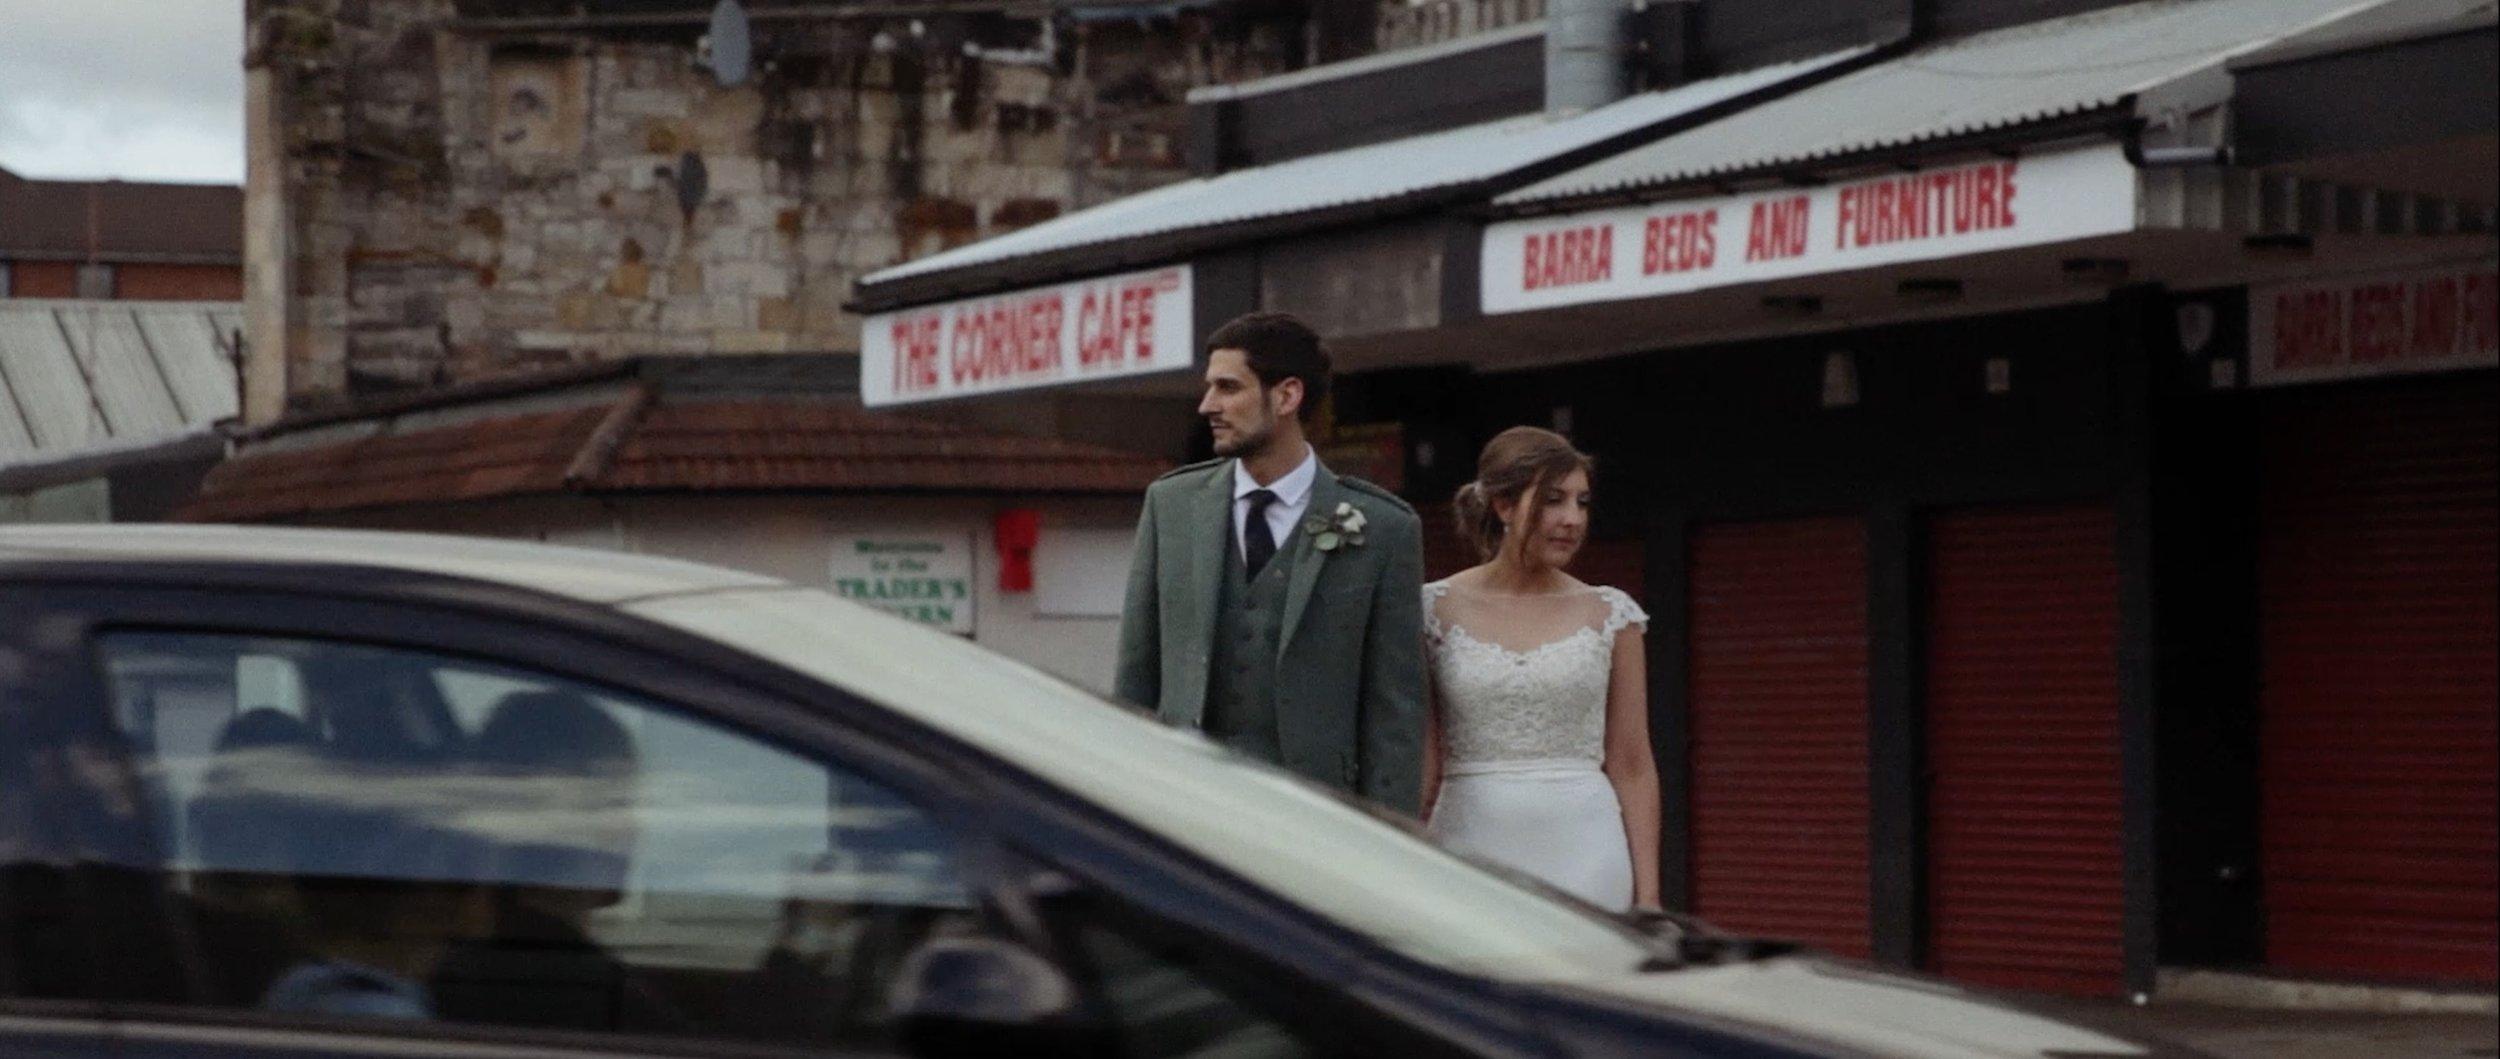 ggs-yard-wedding-videographer_LL_05.jpg